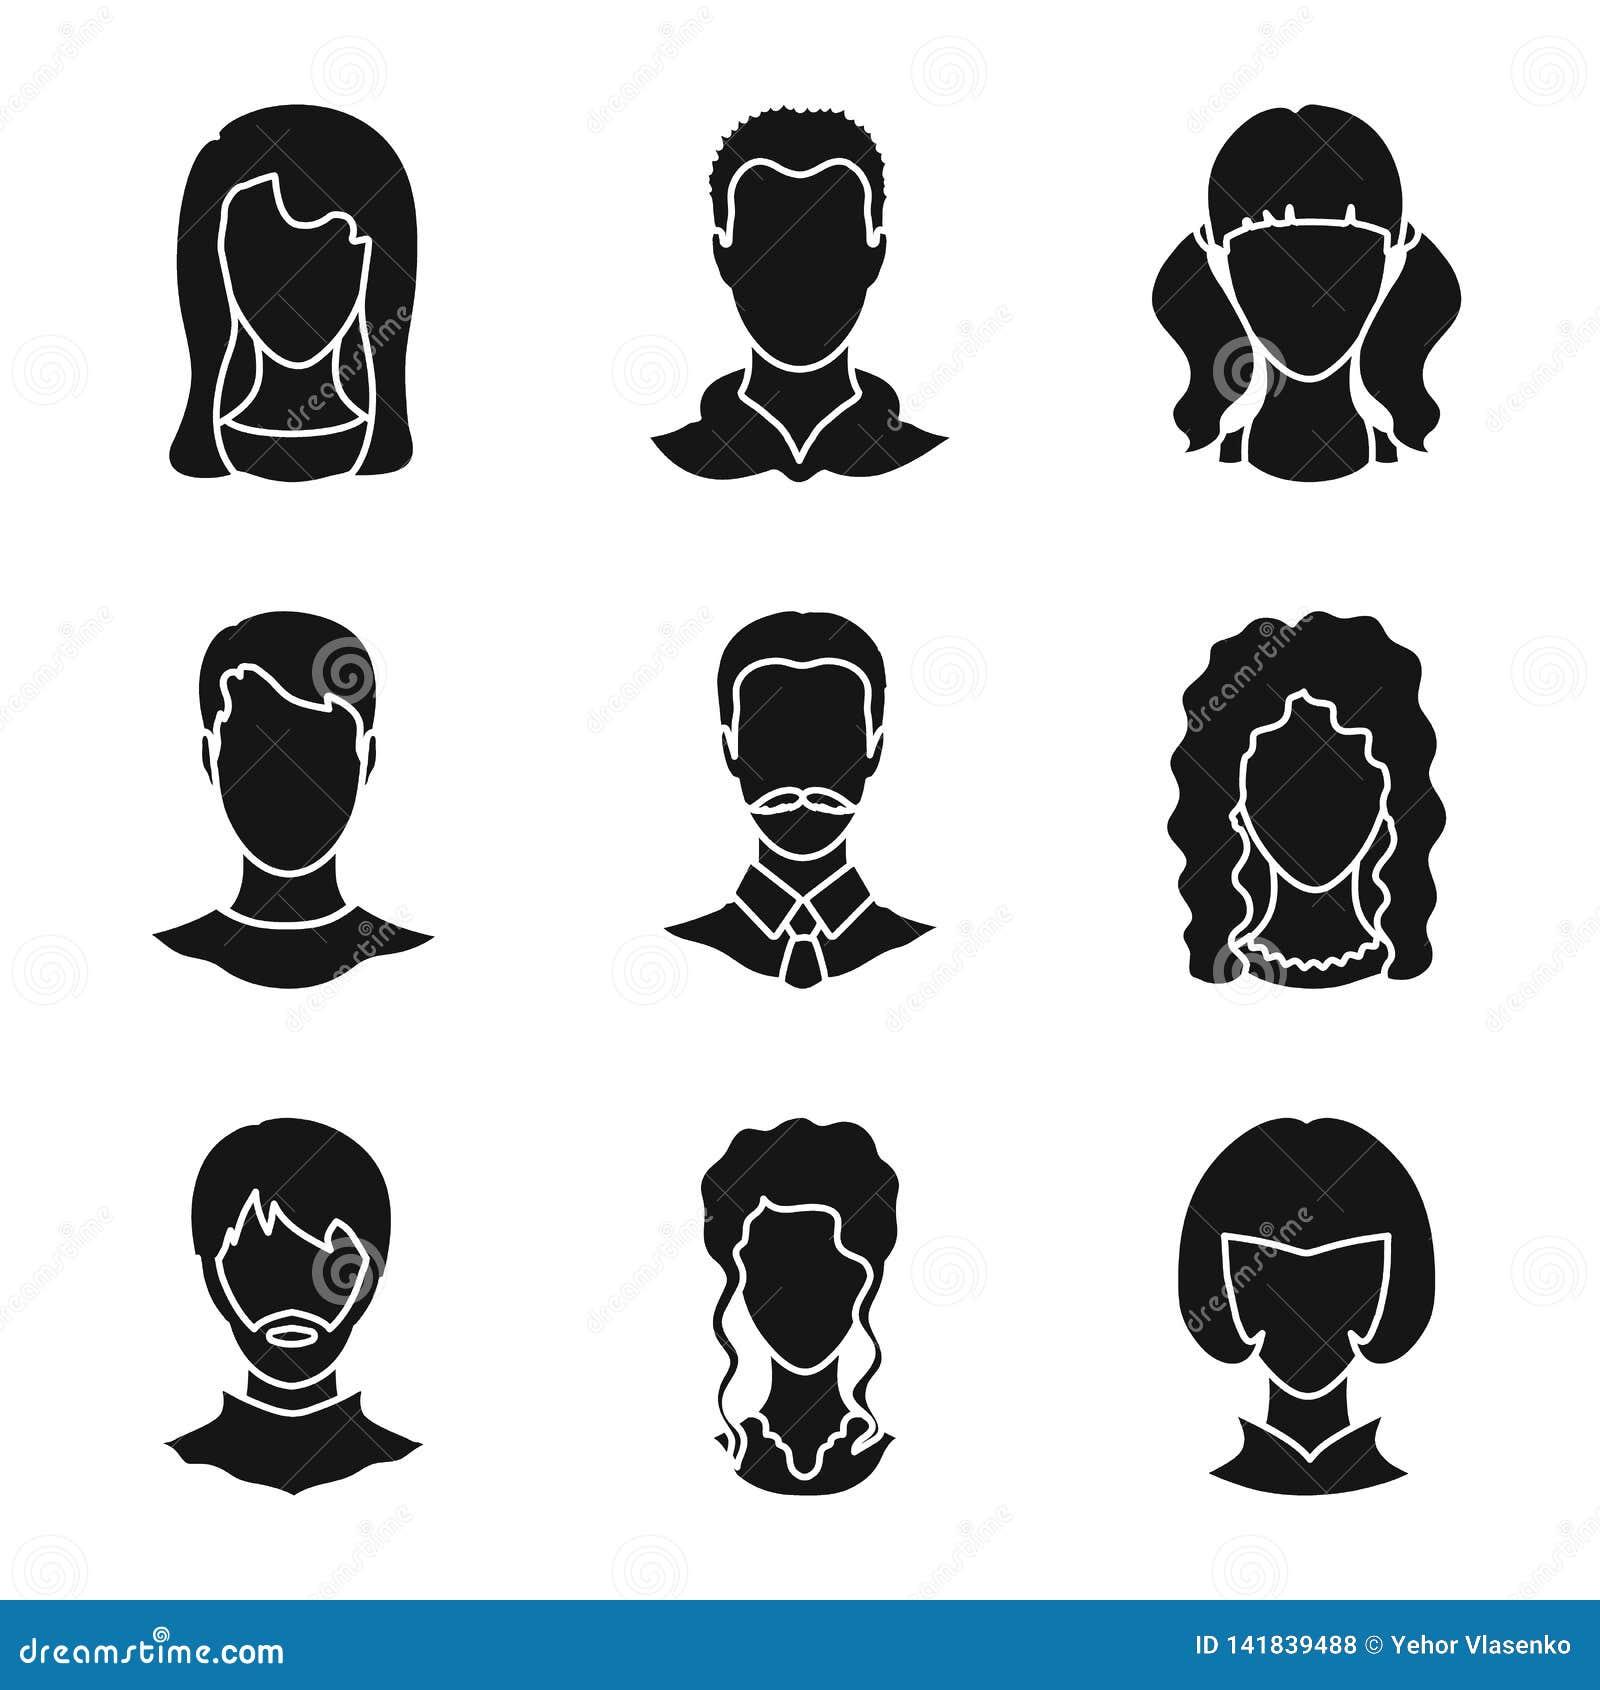 Иллюстрация вектора символа характера и профиля Установите характера и фиктивной иллюстрации вектора запаса